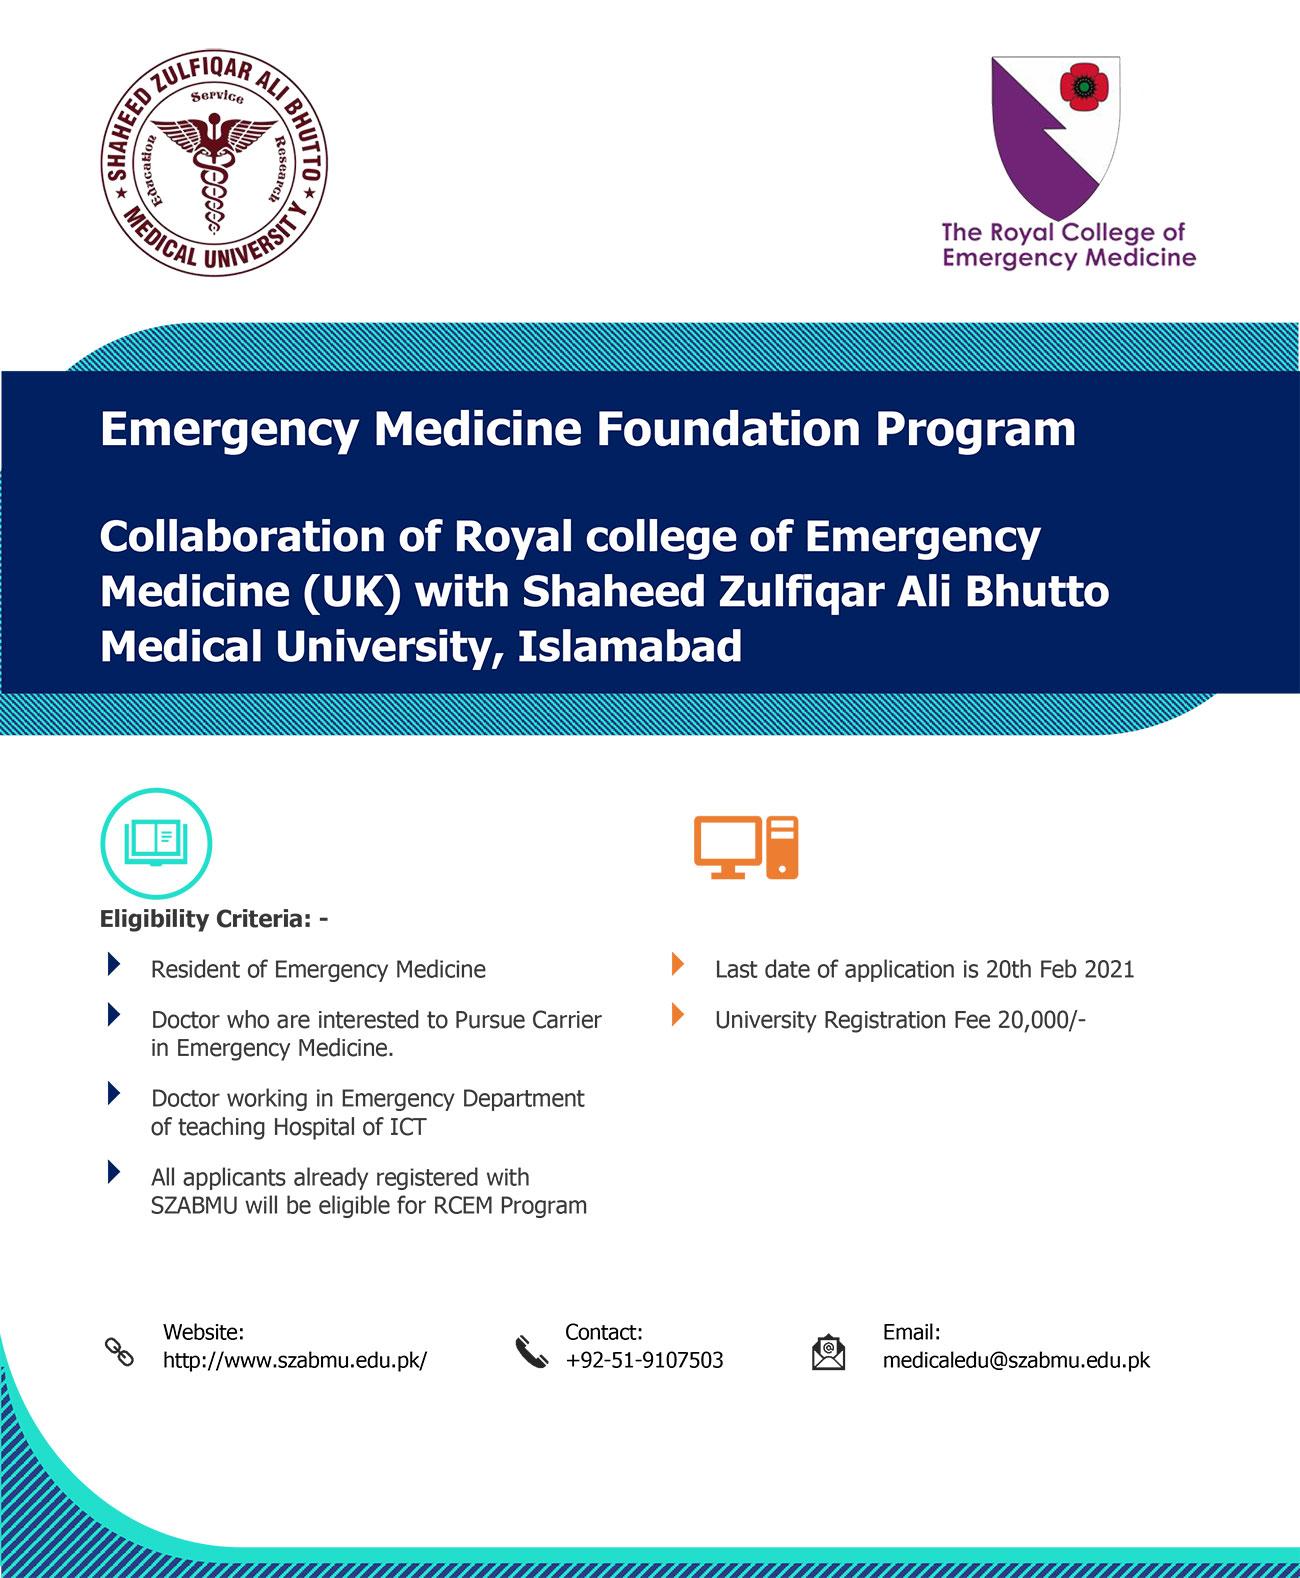 The Emergency Medicine Foundation Programme